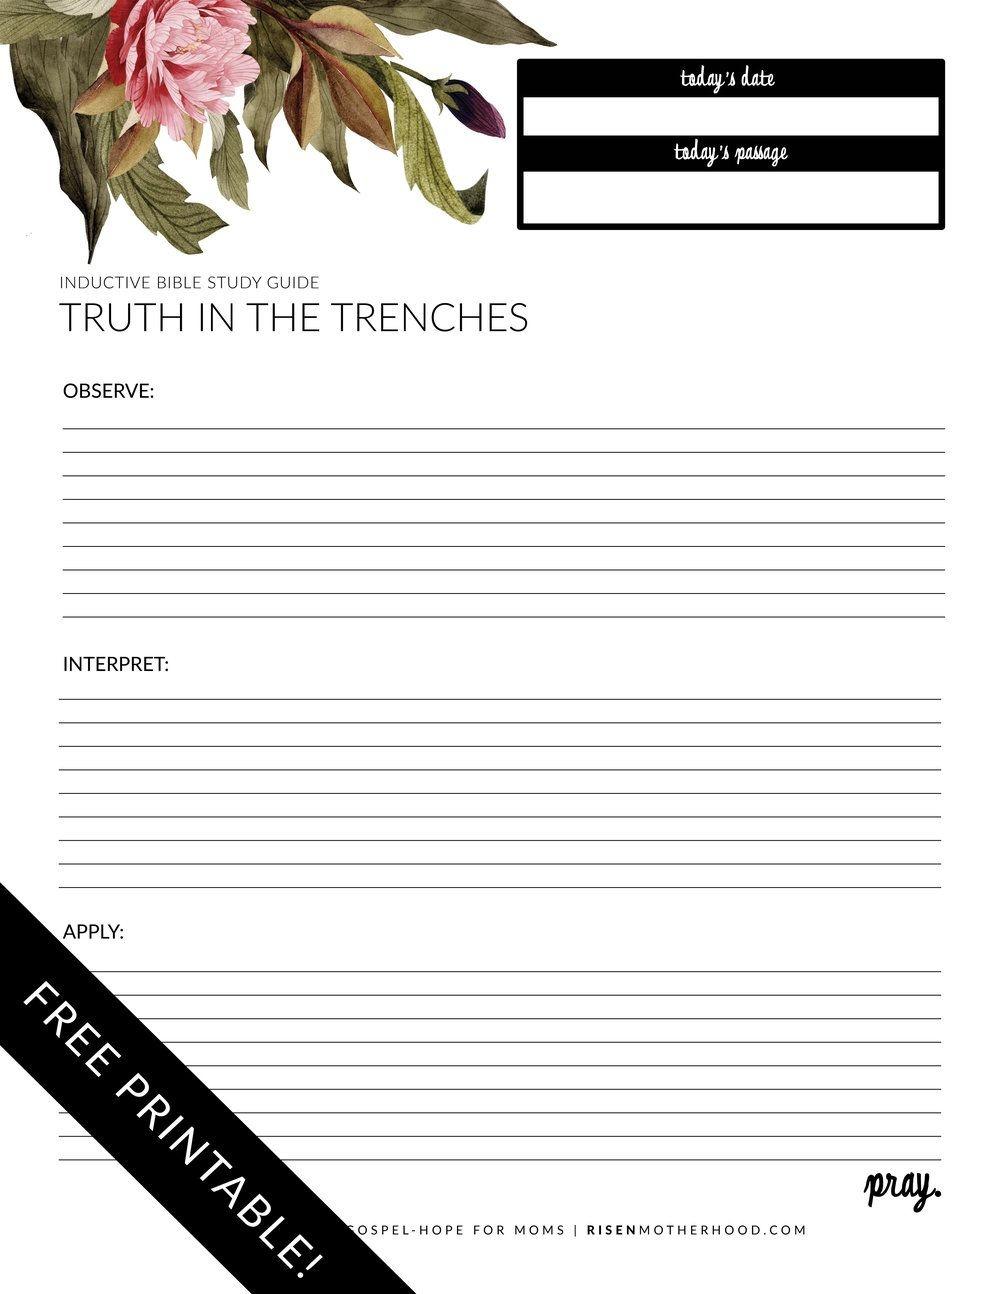 Free Printable: Inductive Bible Study Worksheets & Companion Card - Free Printable Bible Study Lessons